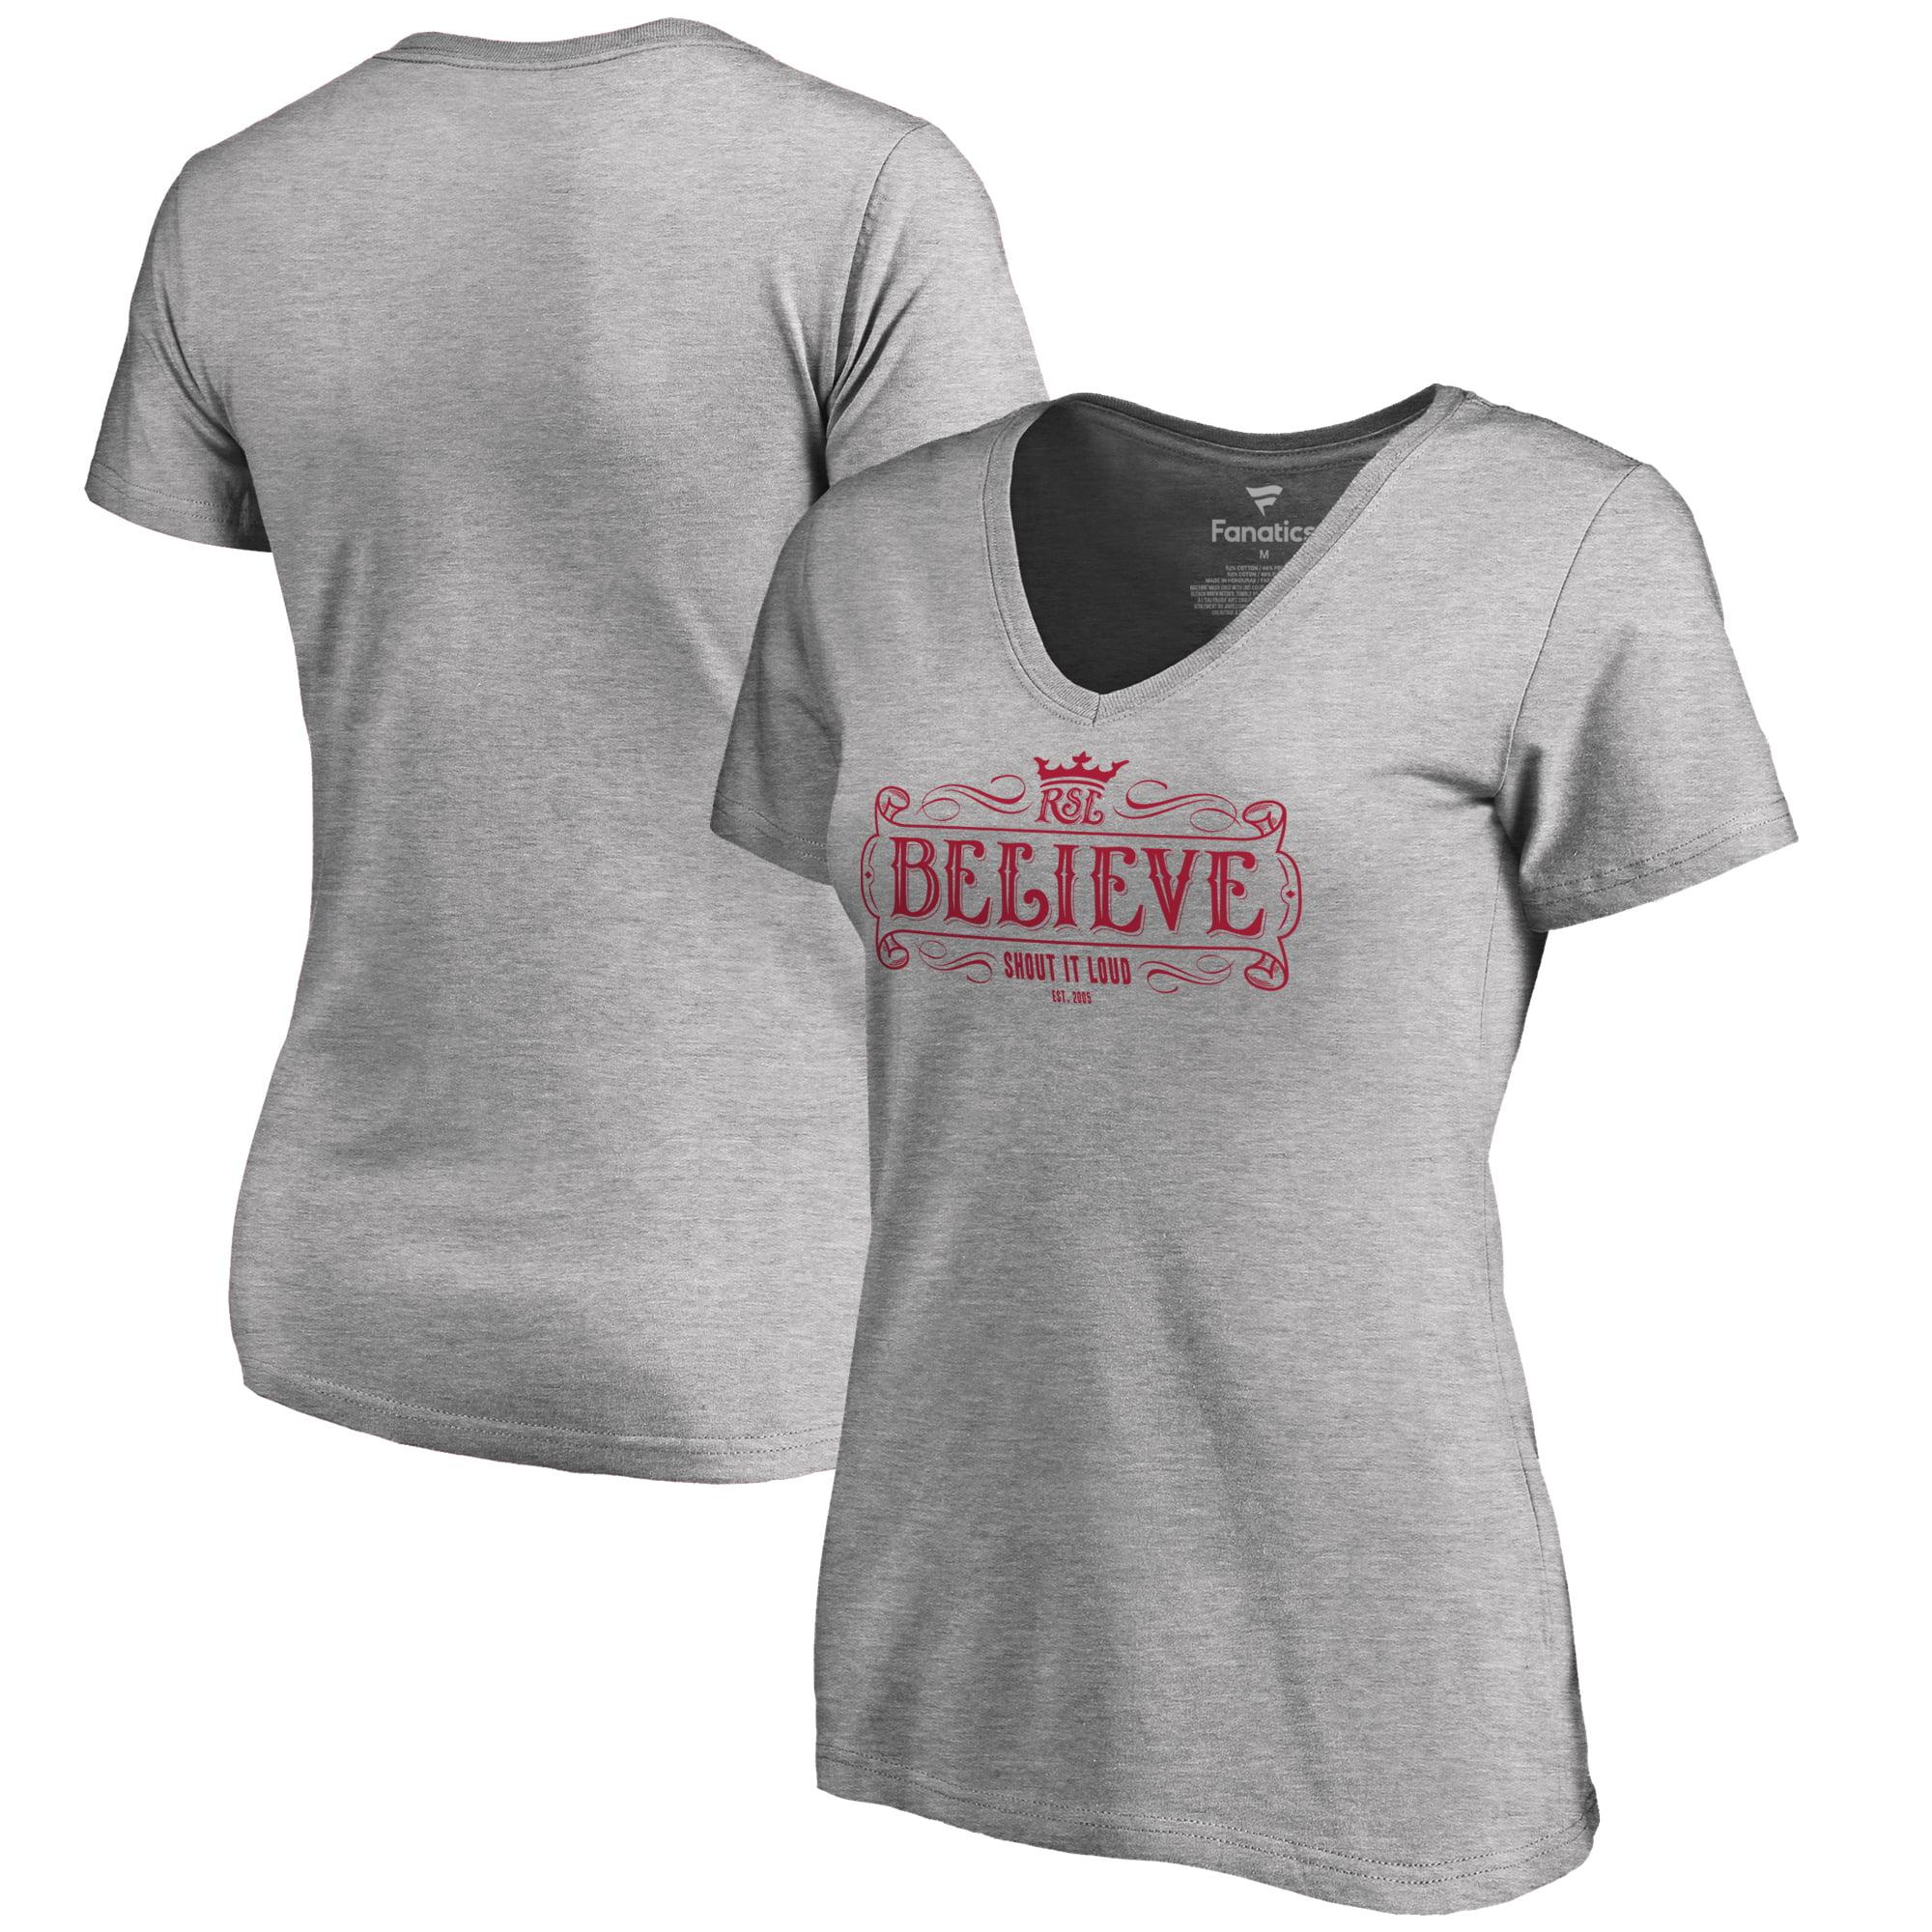 Real Salt Lake Fanatics Branded Women's Hometown Collection Battle Hymn V-Neck T-Shirt - Heather Gray